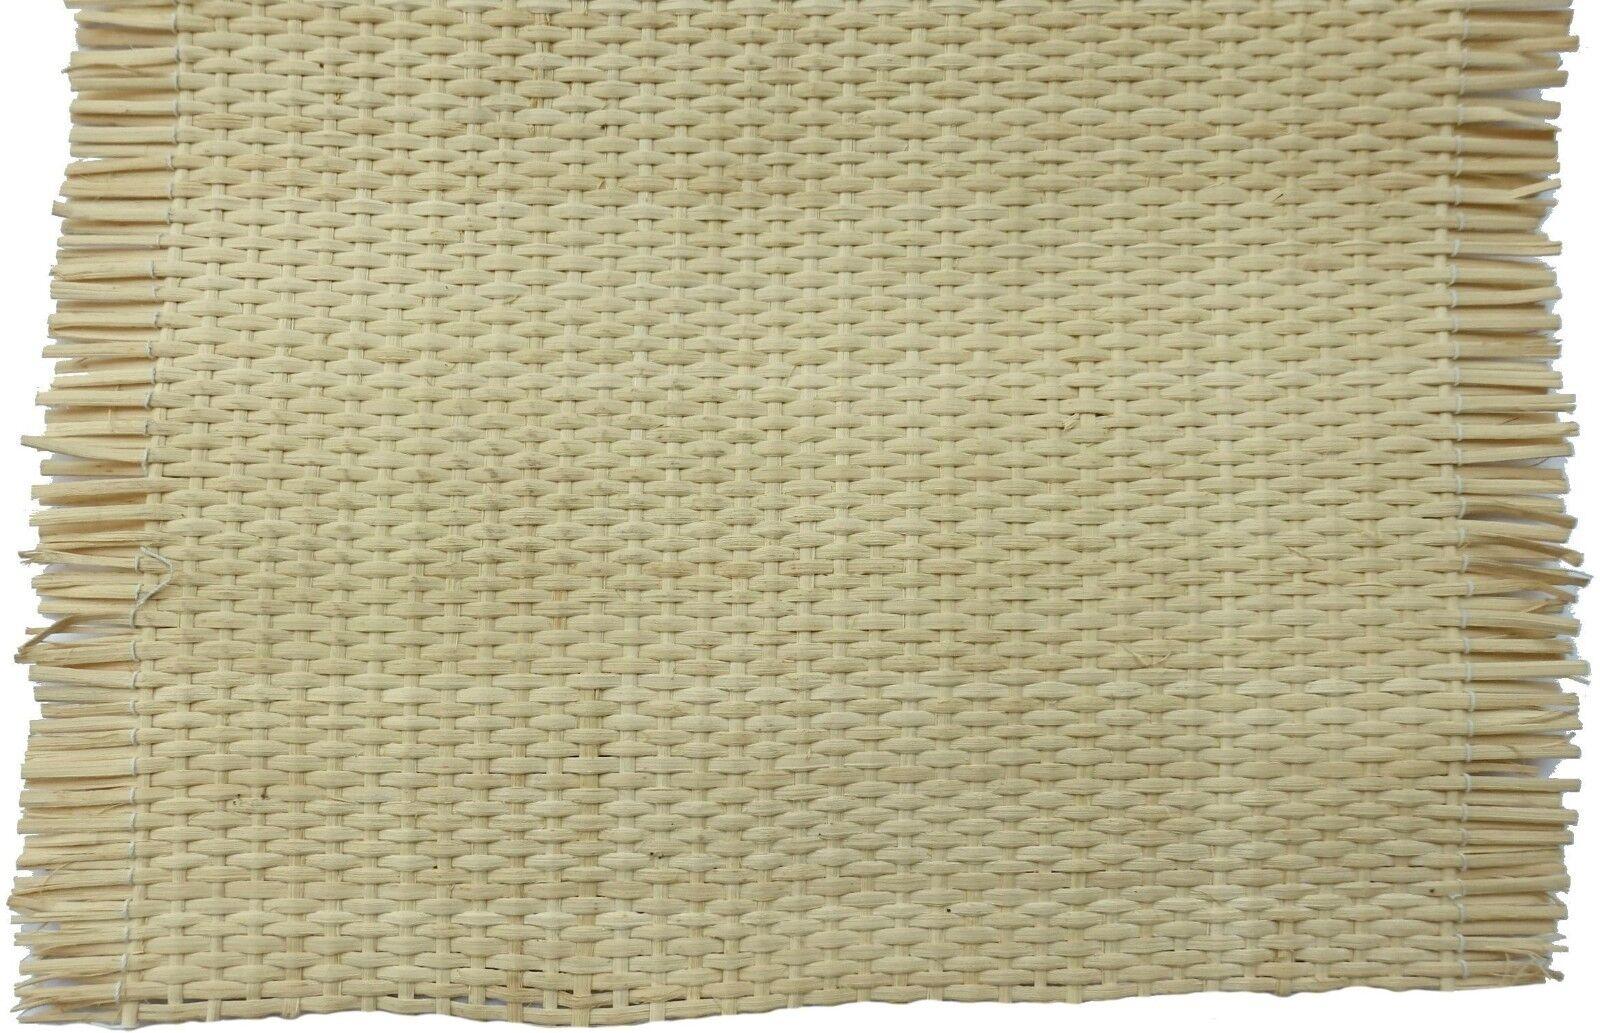 Flechtgewebe Flechtmatte Sichtschutz aus Peddigschiene 5mm - 1 Meter x 45cm